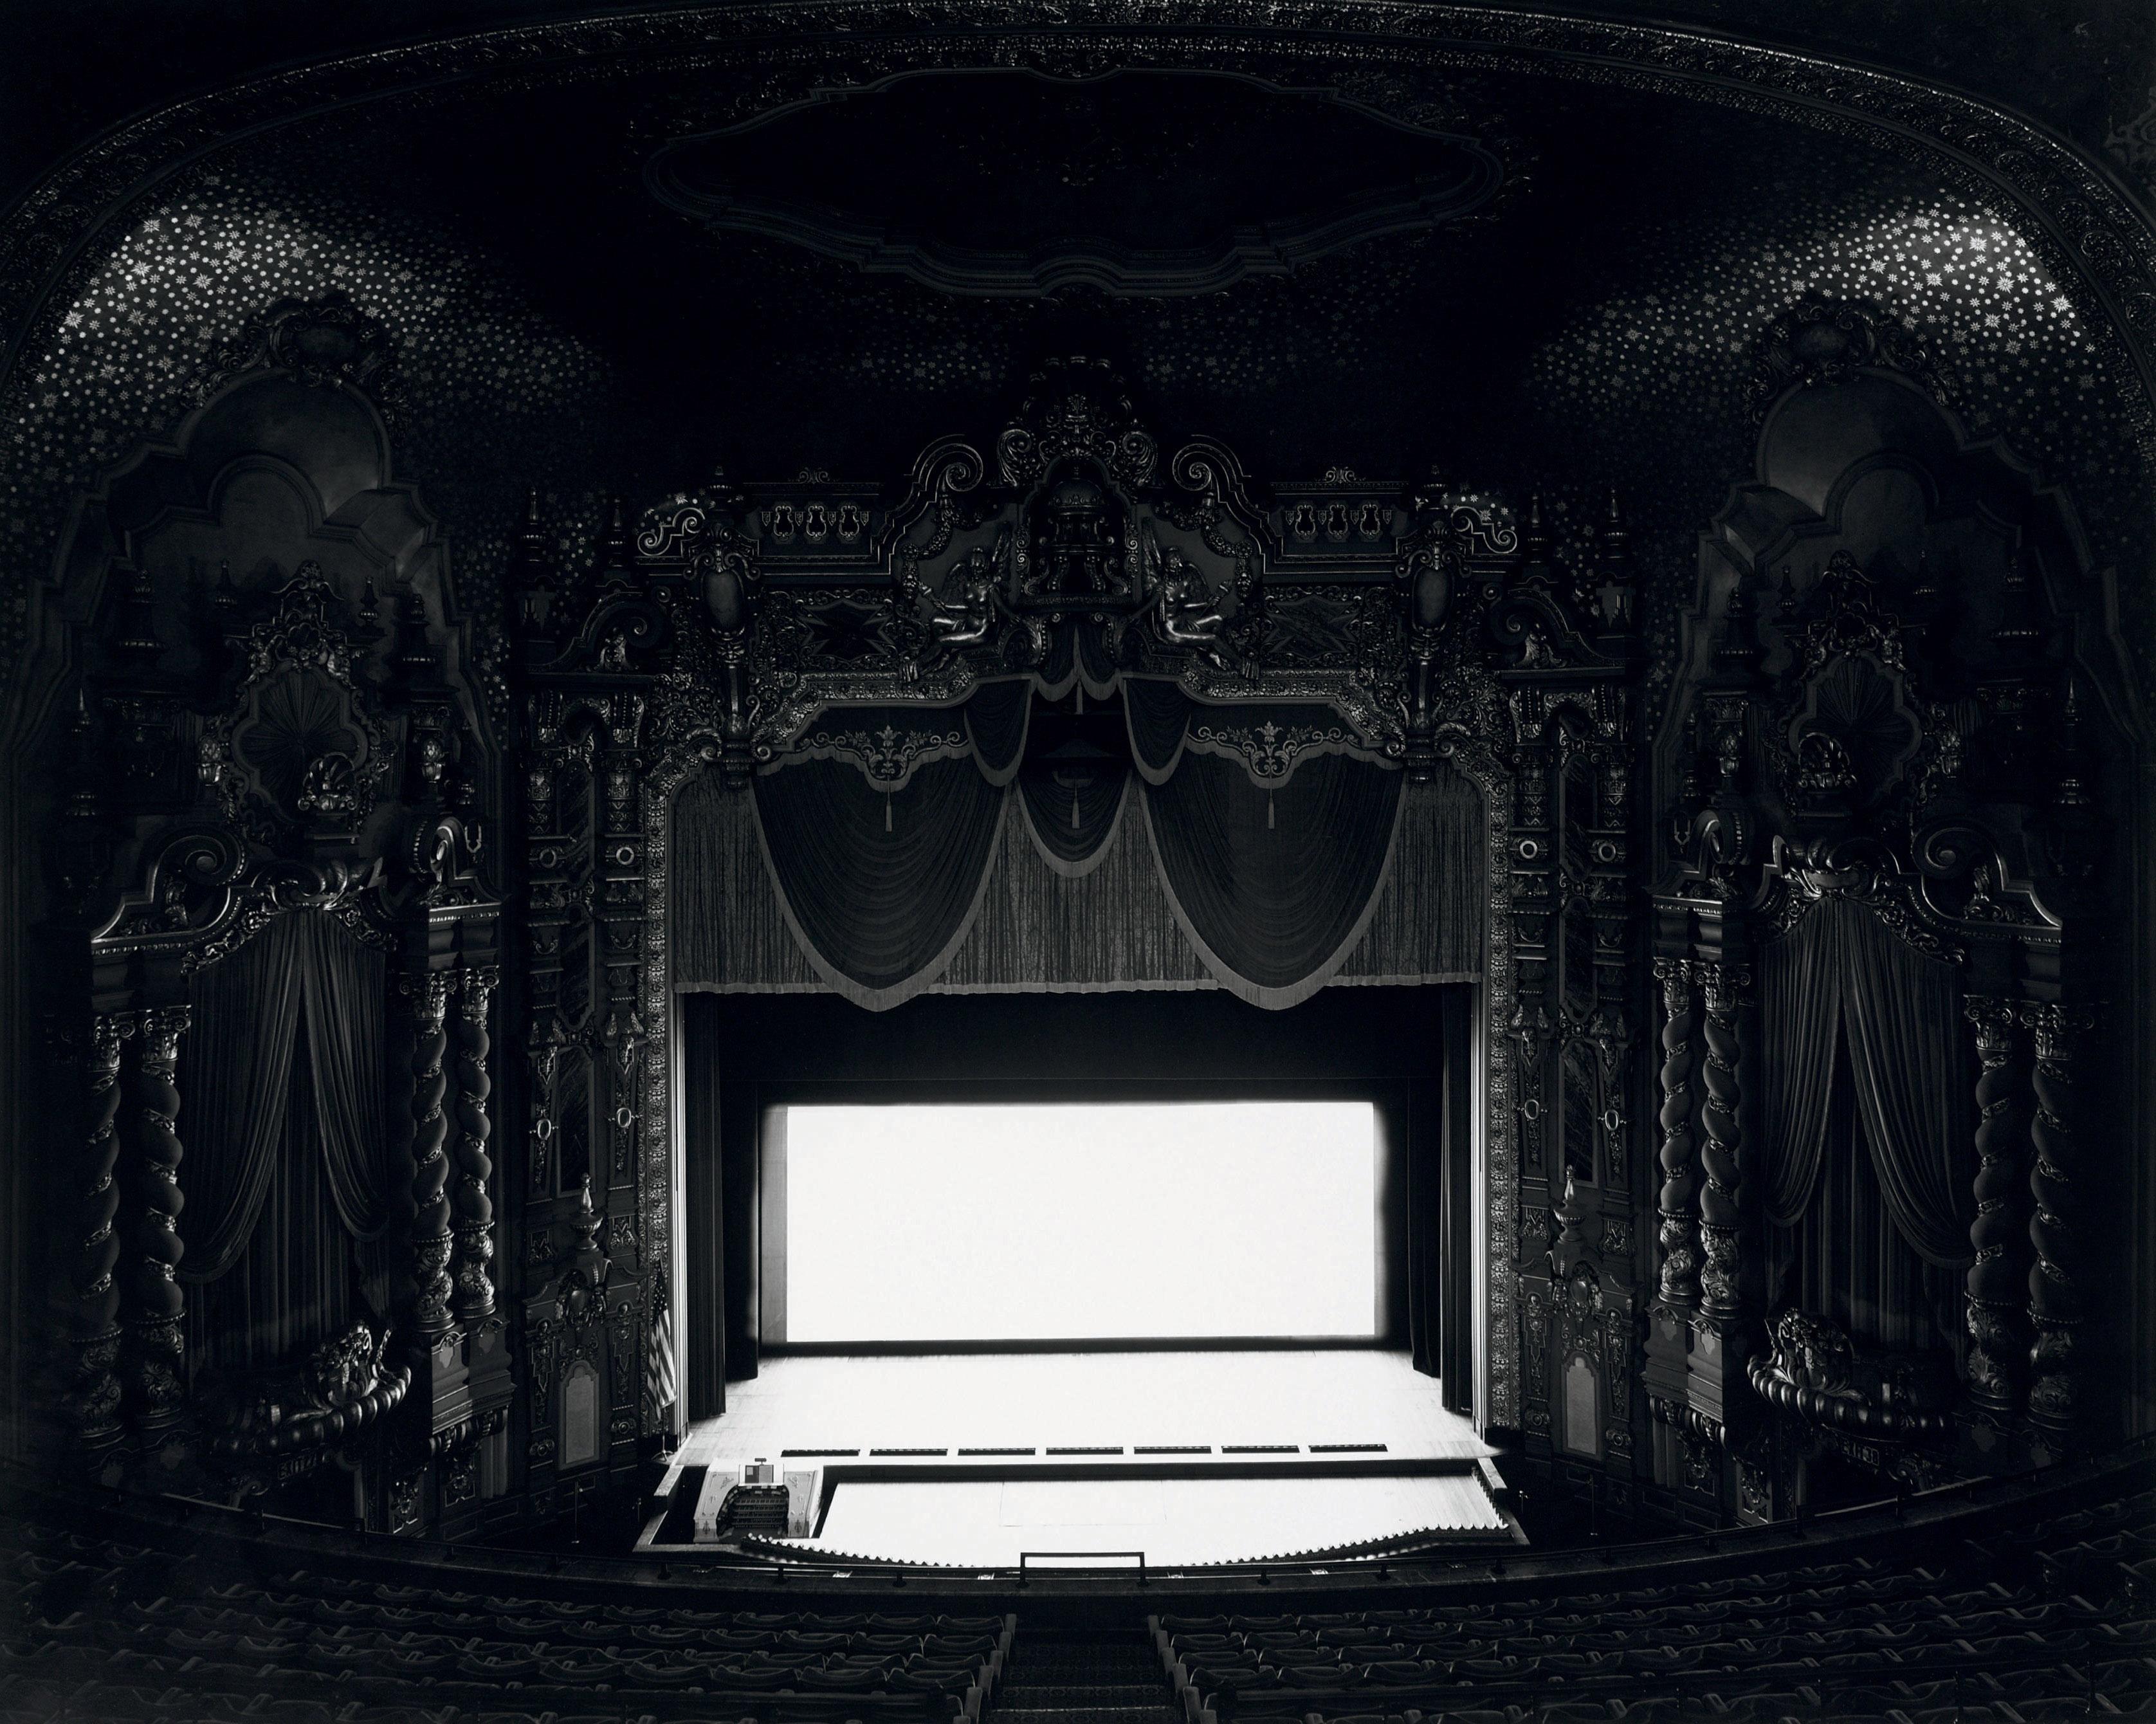 Hiroshi Sugimoto - Theaters - Ohio Theater, Ohio, 1980